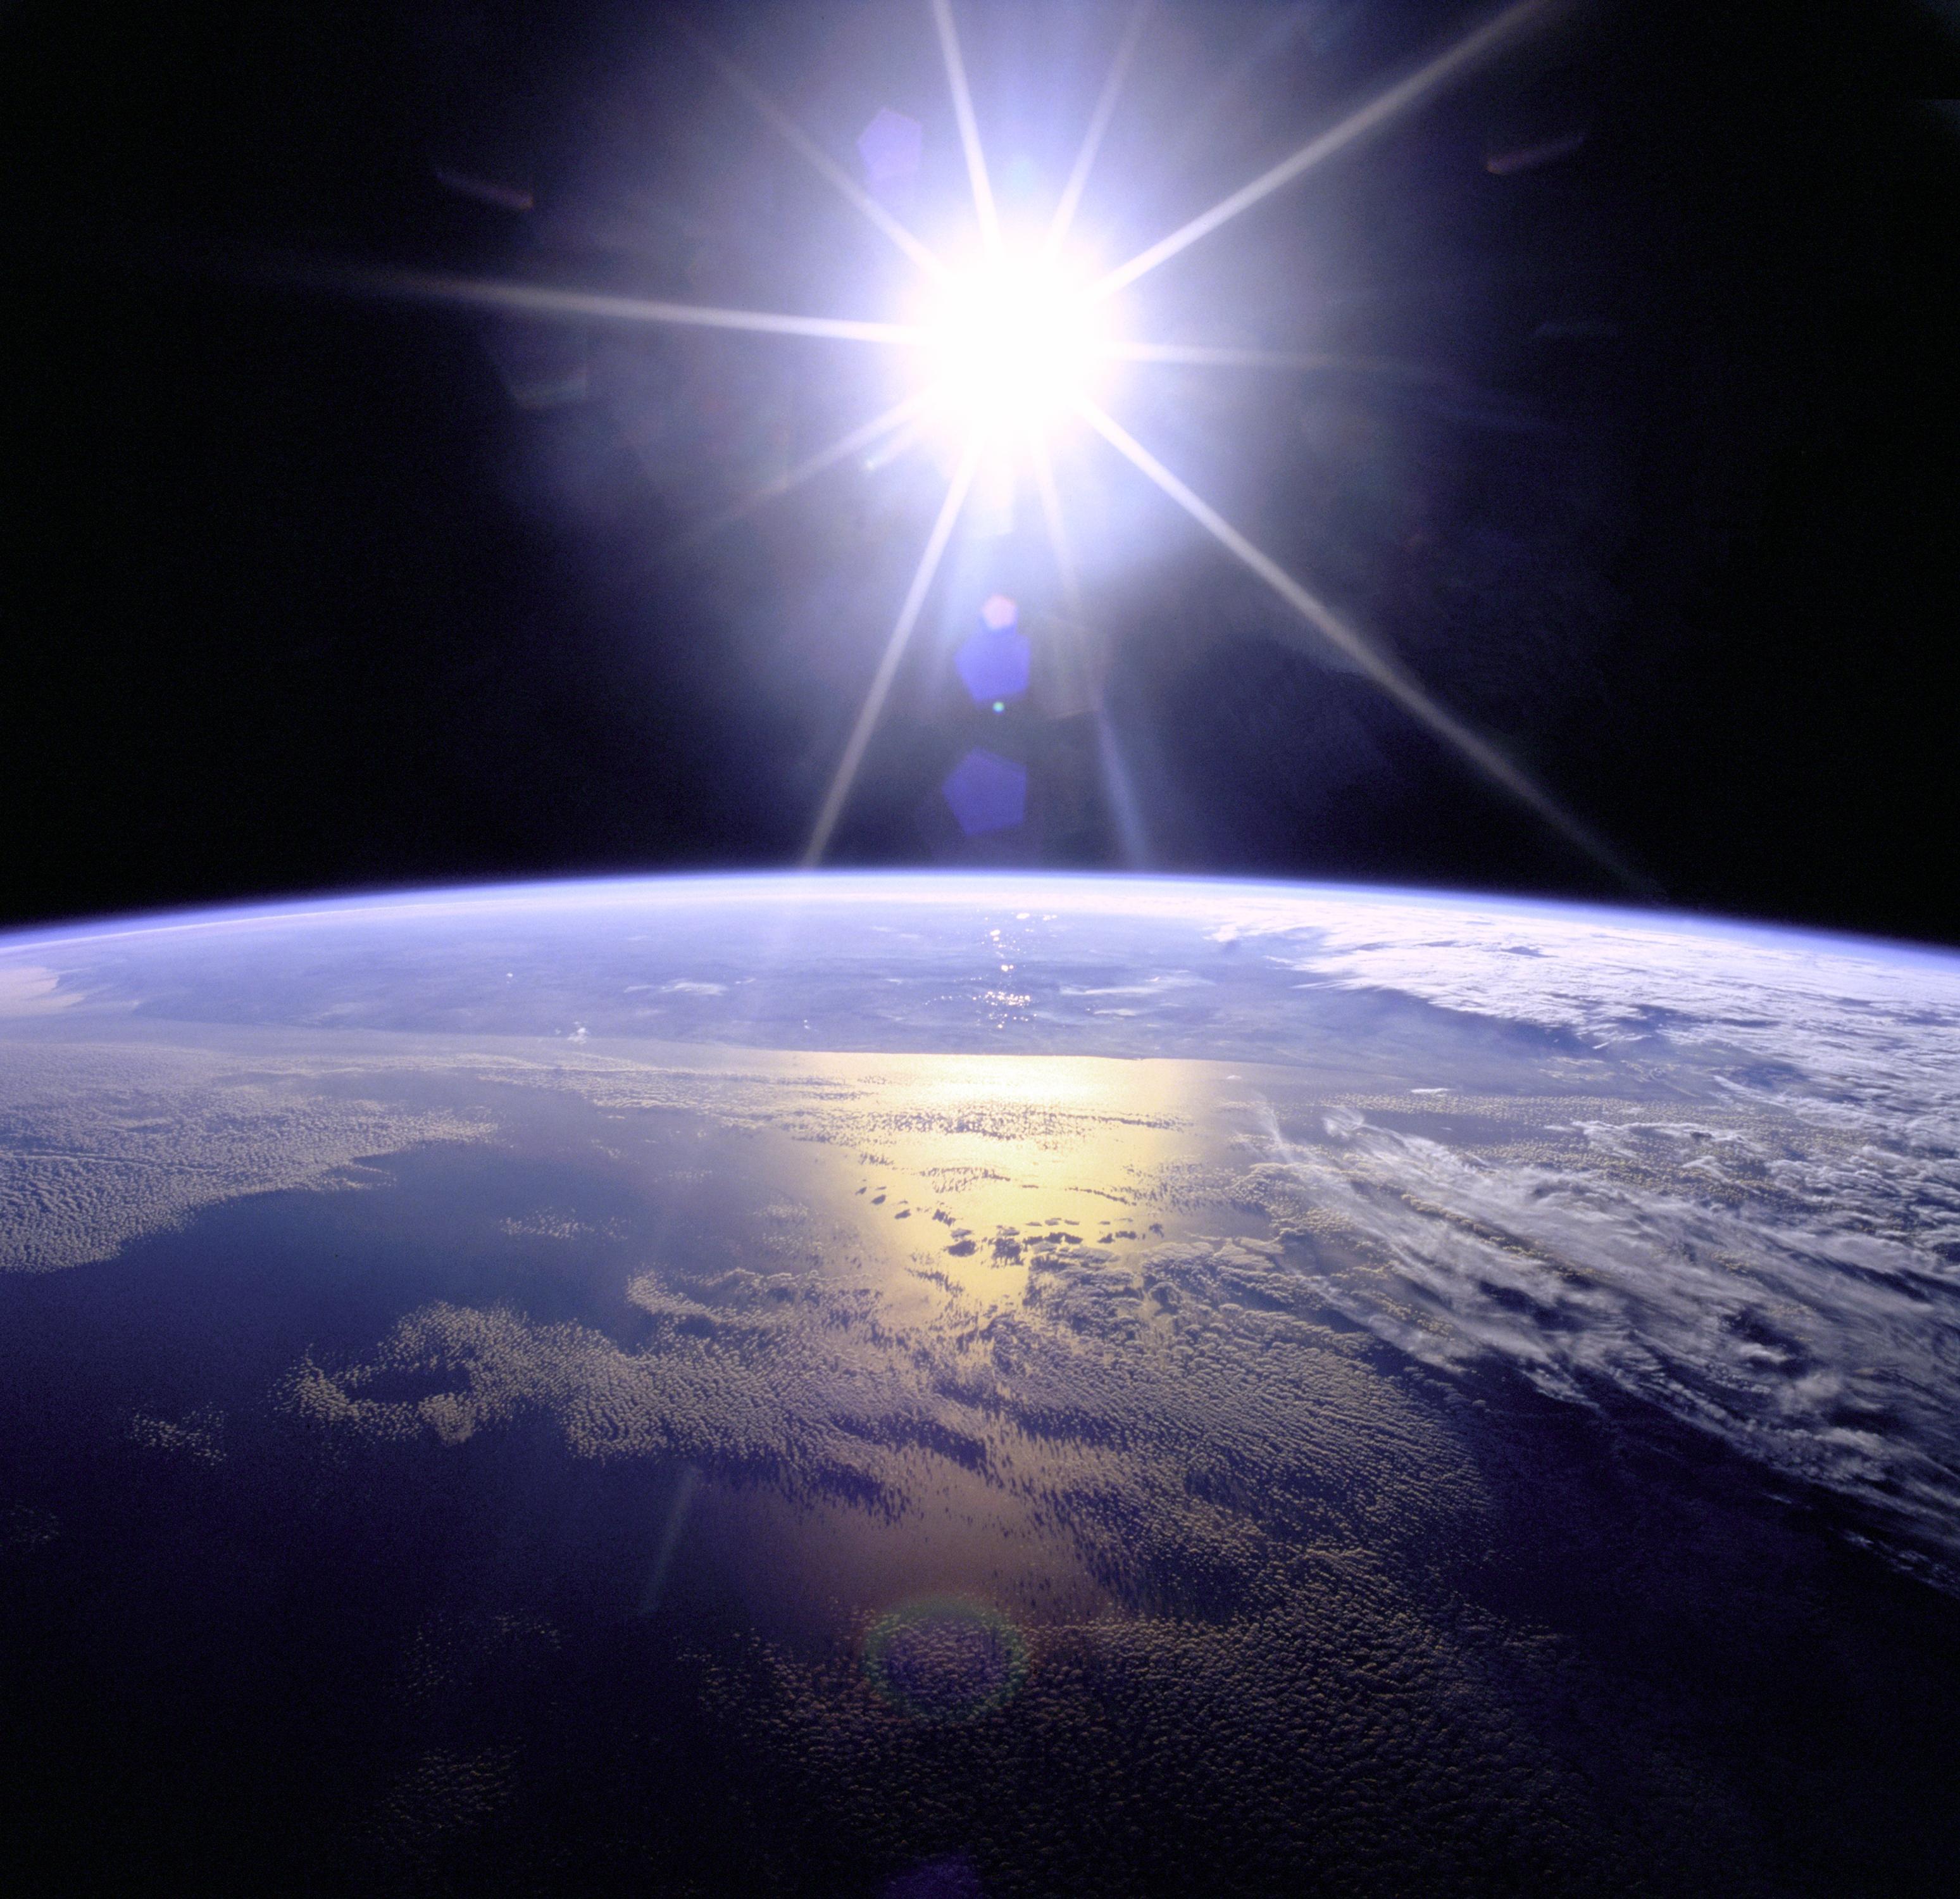 Full Sunburst over Earth found on Wikipedia